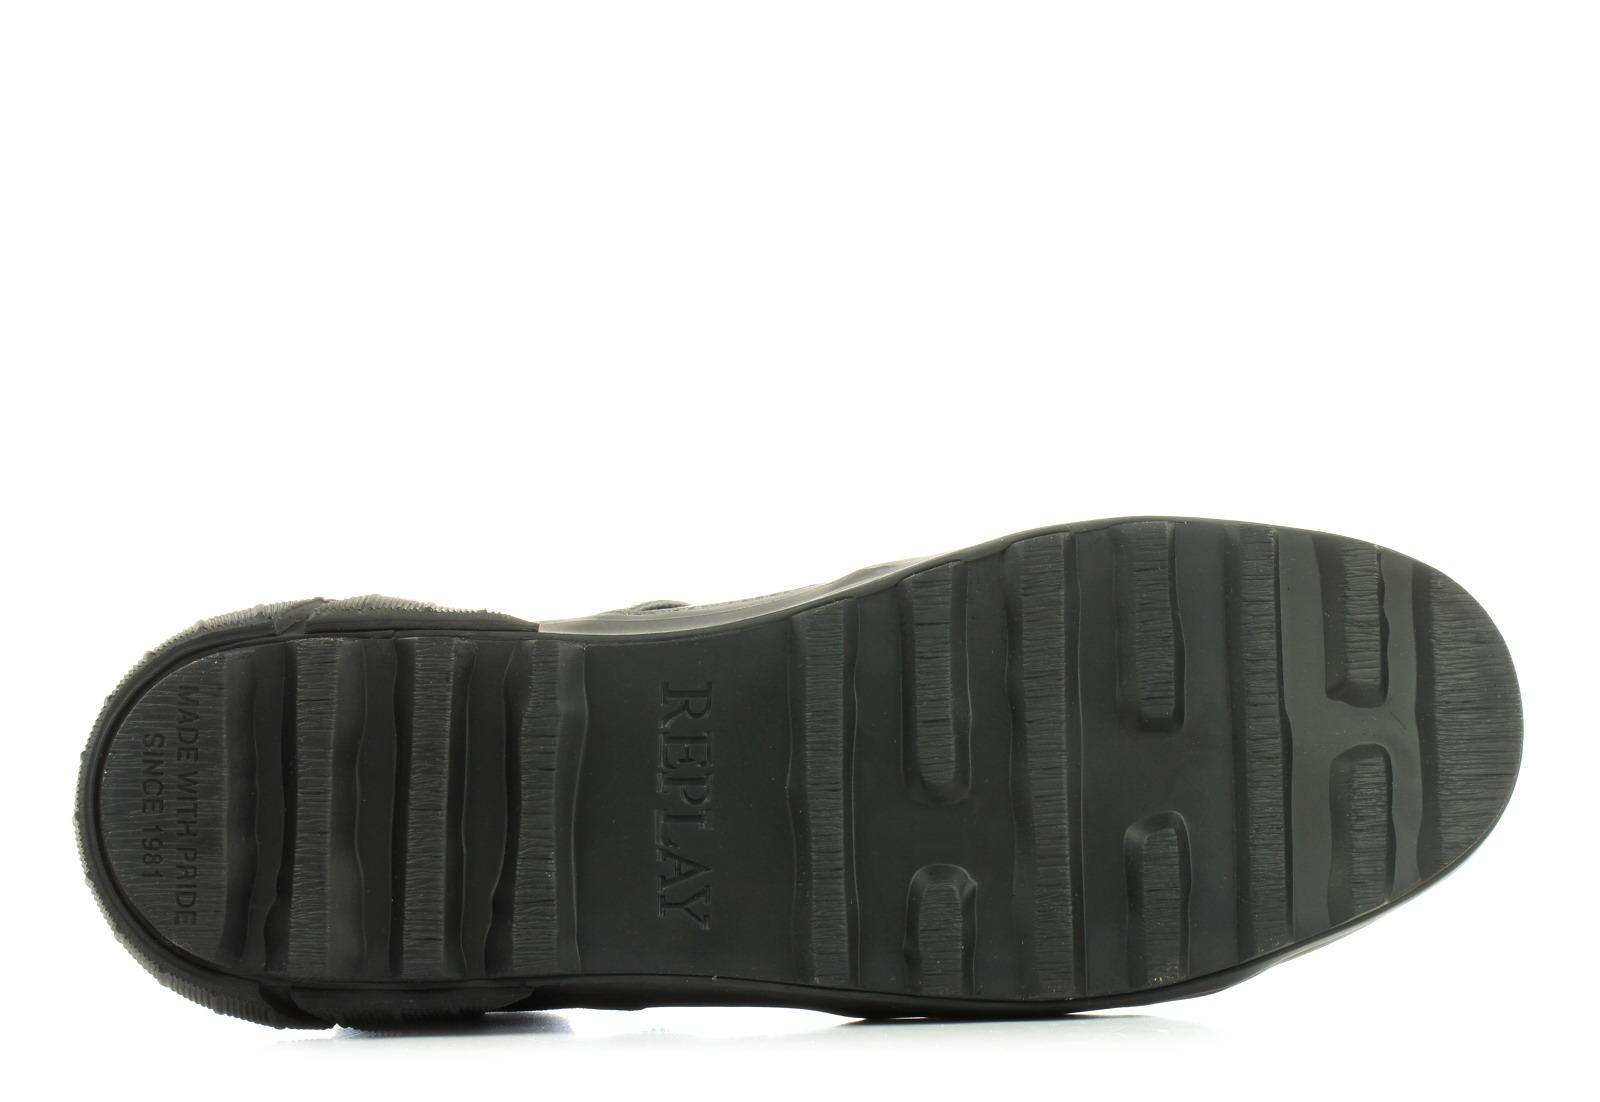 Replay Cipő - Rv760013s - RV760013S-0019 - Office Shoes Magyarország 5f8f3cce7c